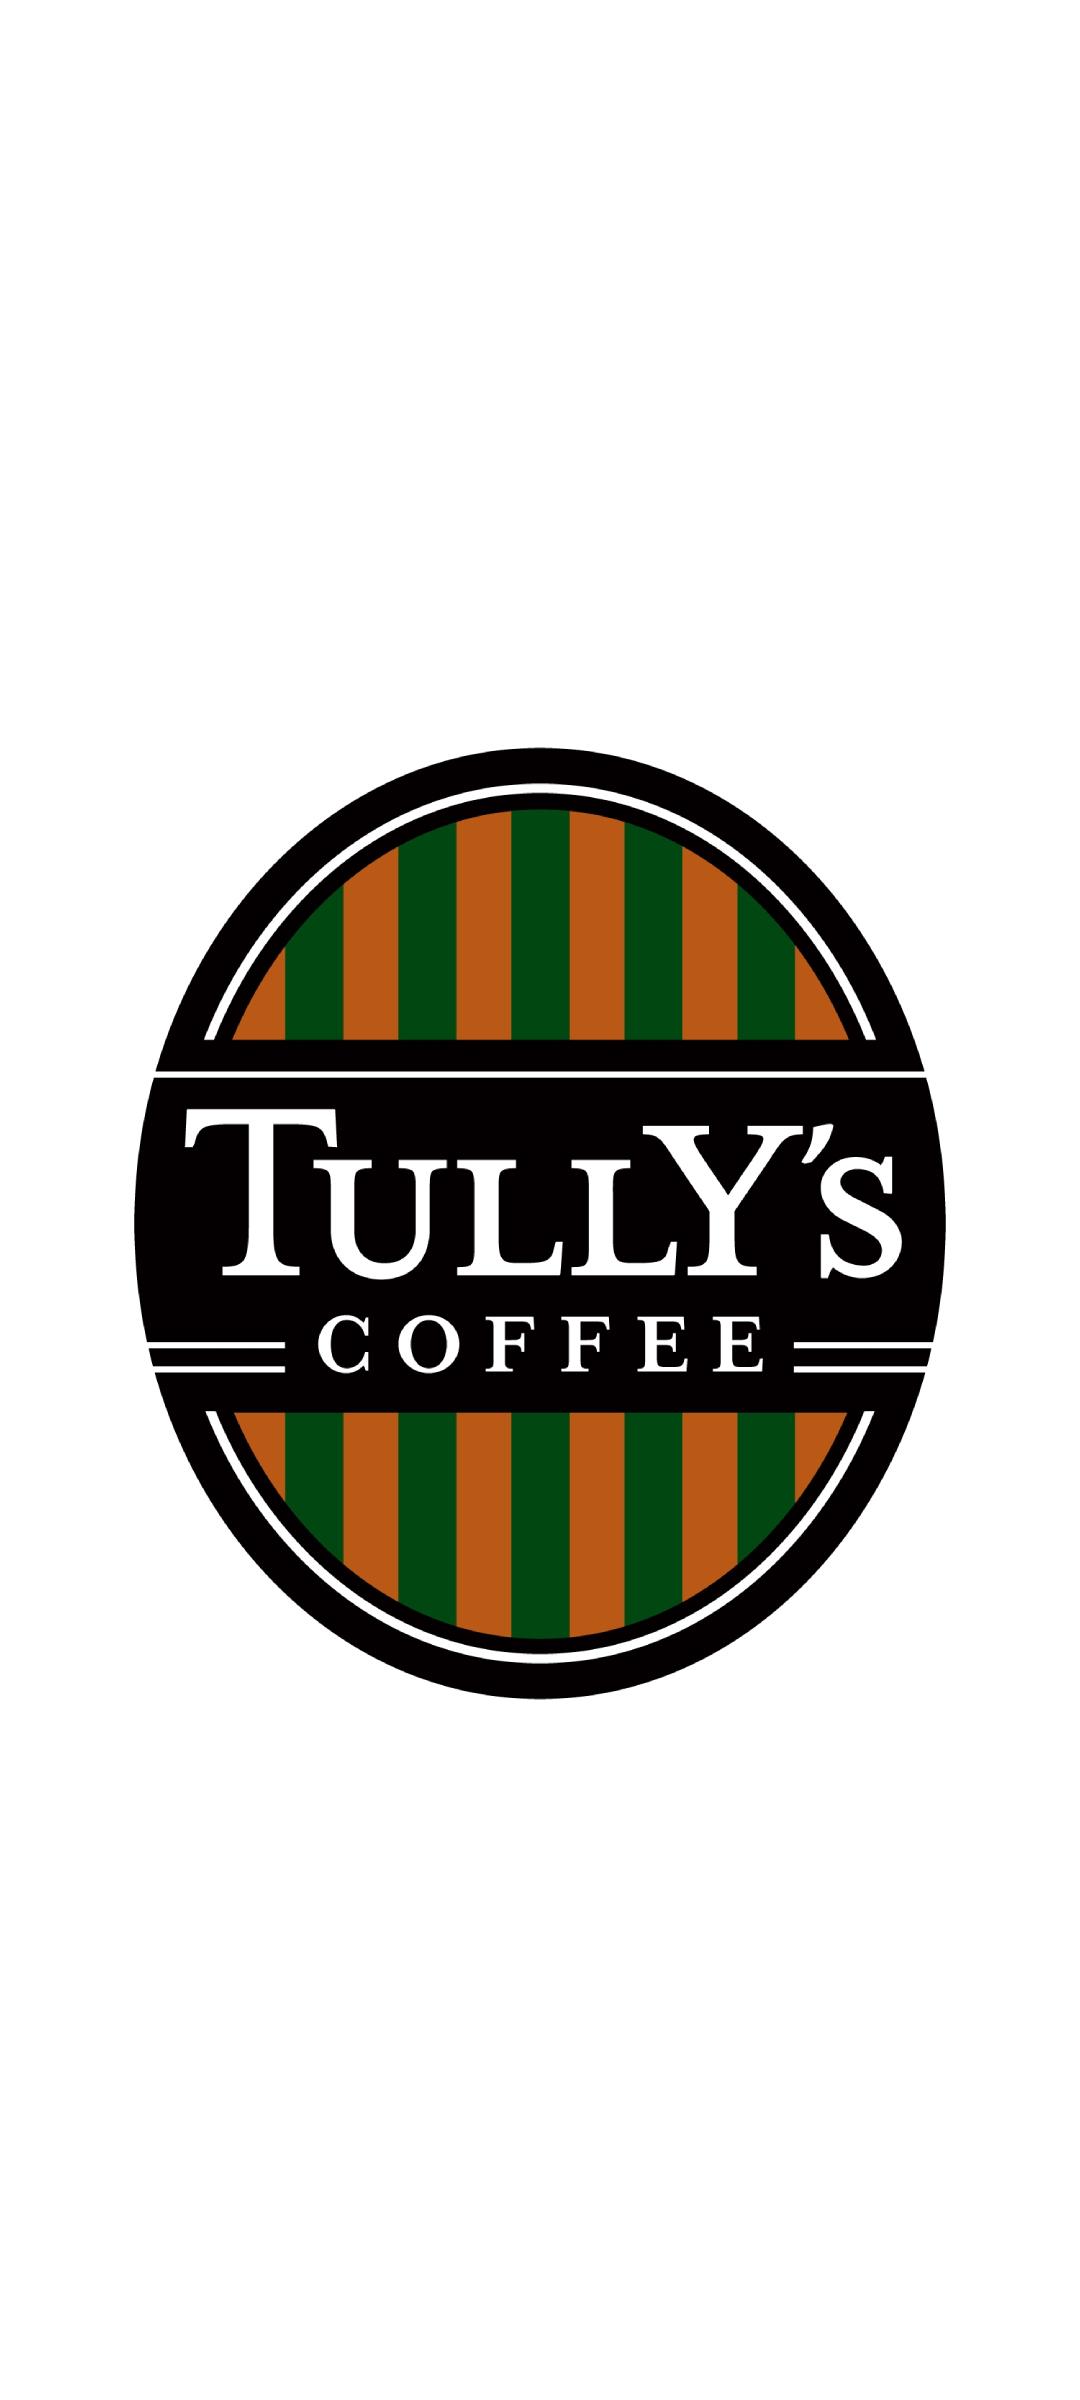 TULLY'S COFFEE(タリーズコーヒー) ZenFone 7 スマホ壁紙・待ち受け